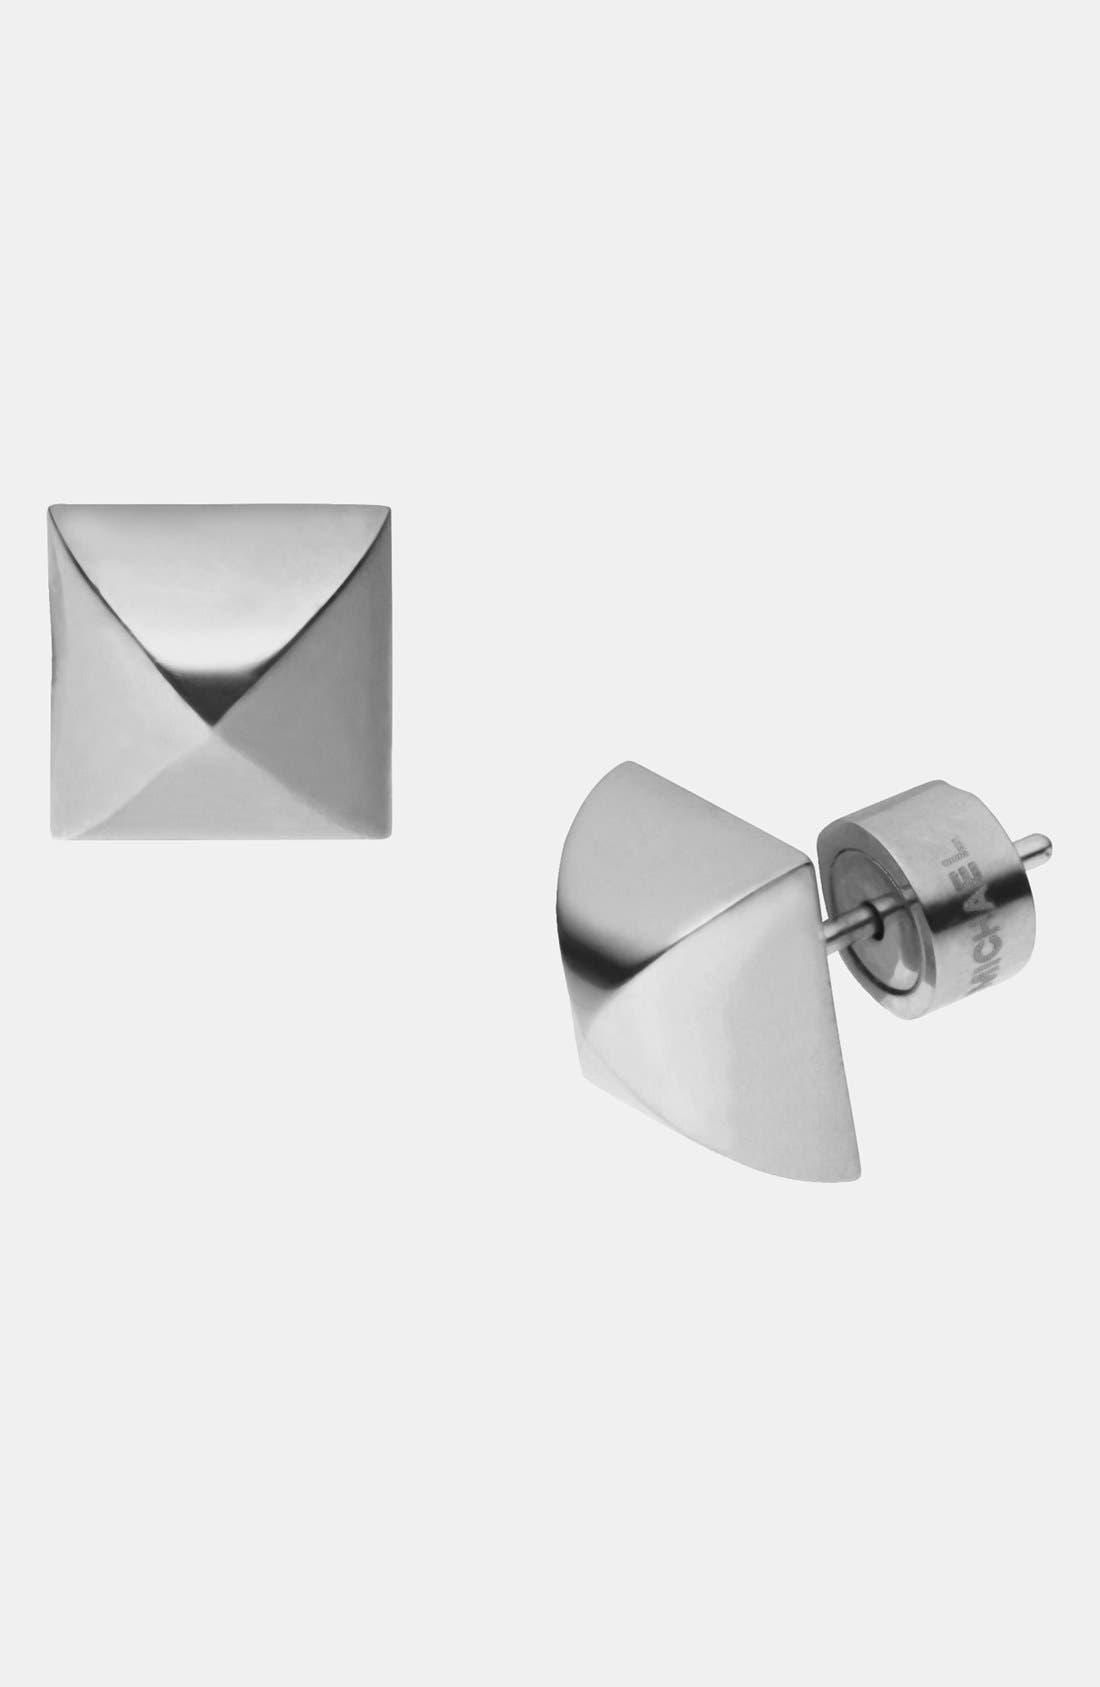 Alternate Image 1 Selected - Michael Kors 'Glam Rock' Pyramid Stud Earrings